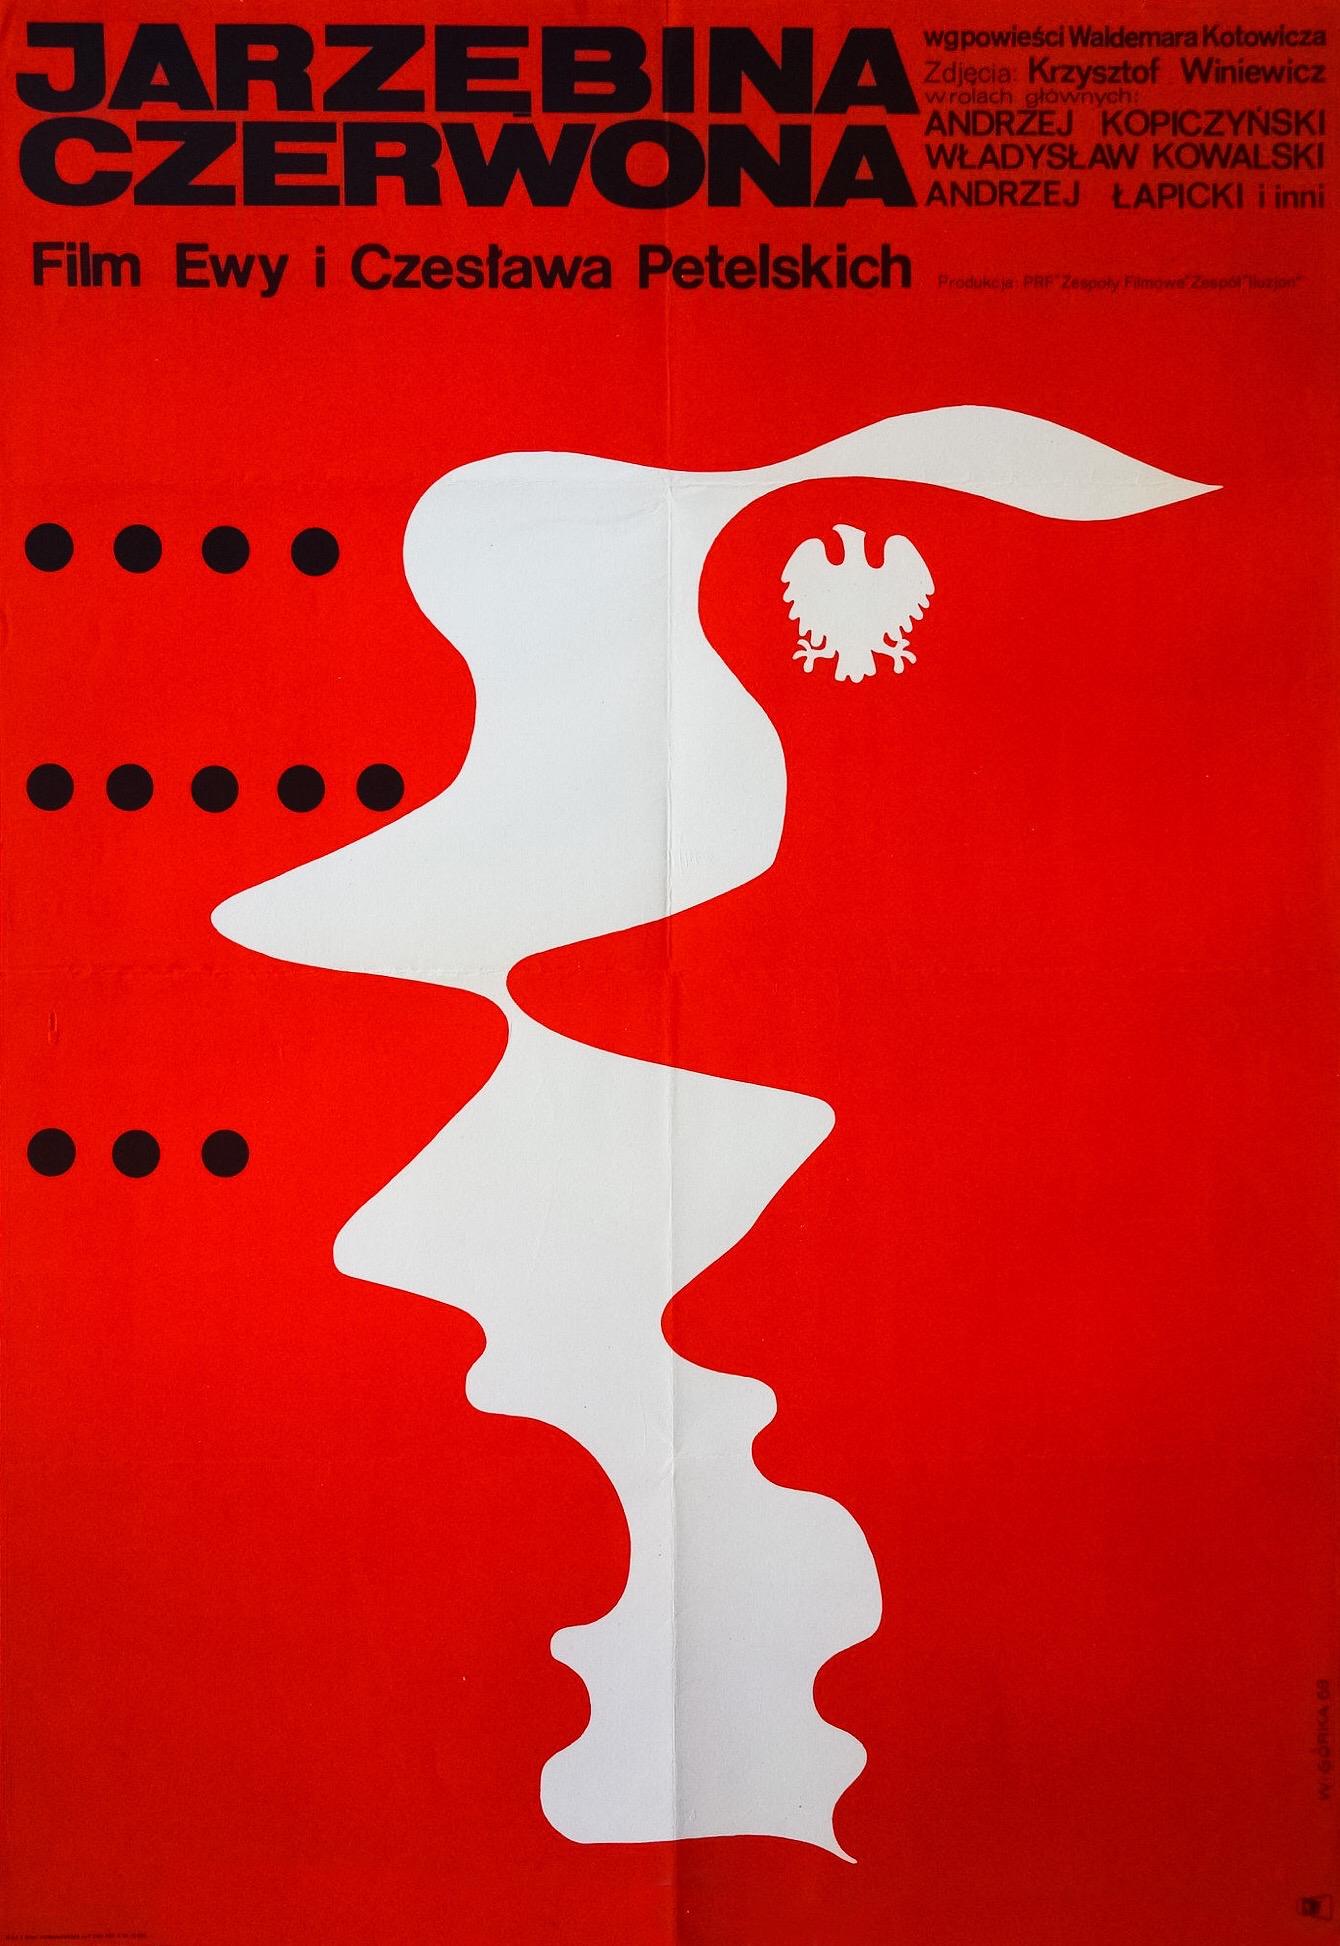 Ewa Petelska and Czeslaw Petelski in Jarzebina czerwona (1970)